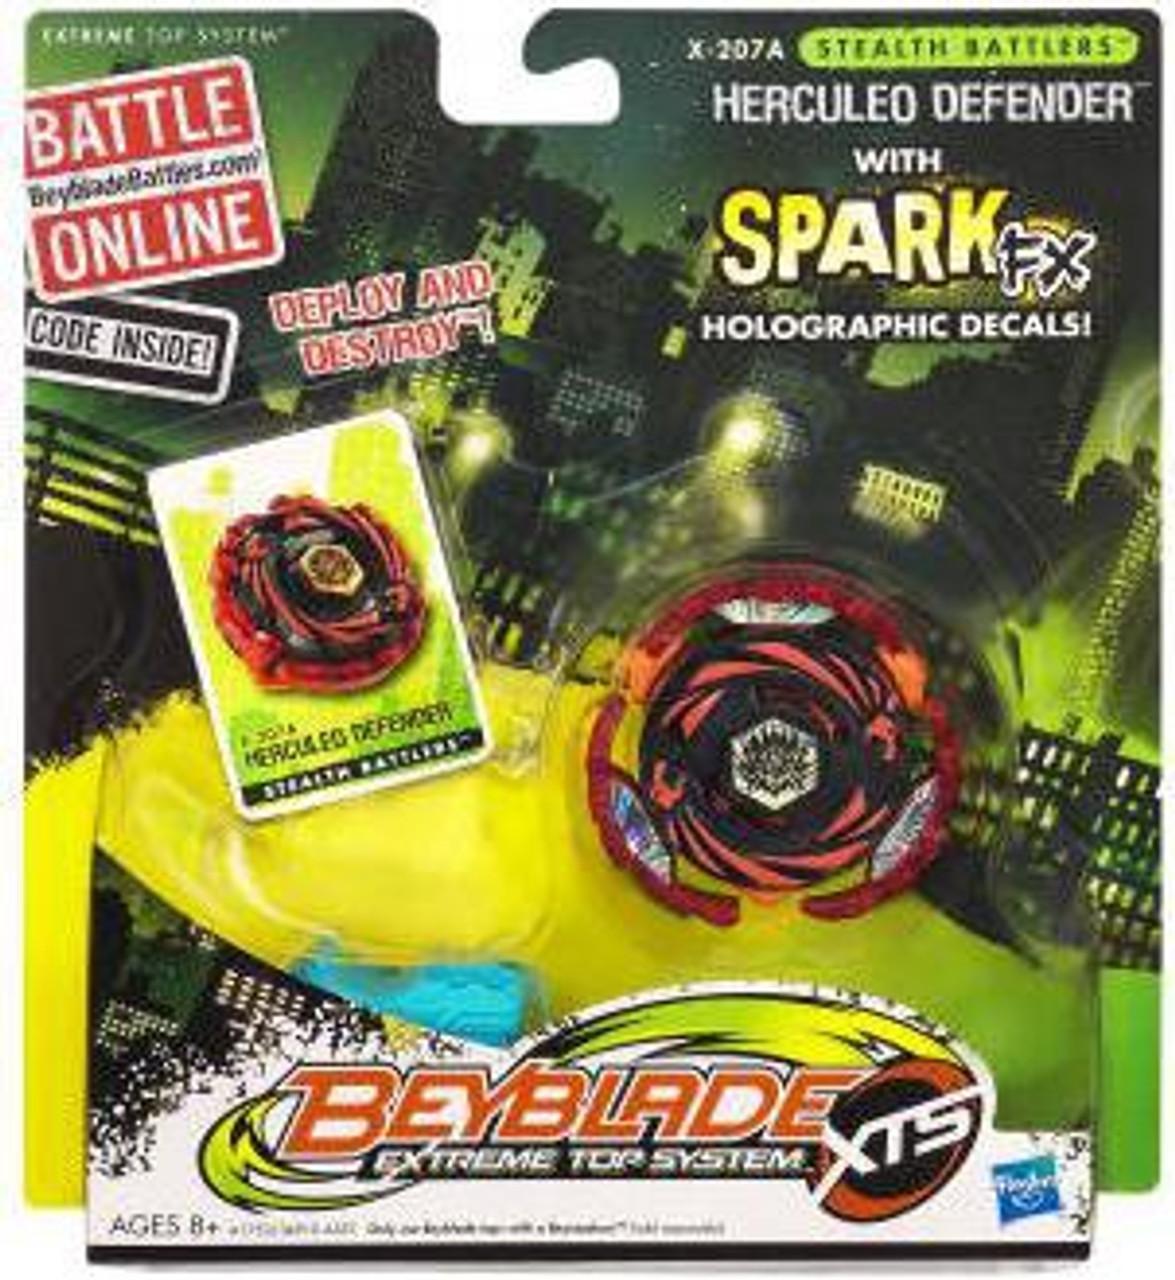 Beyblade XTS Stealth Battlers Herculeo Defender Single Pack X-207A